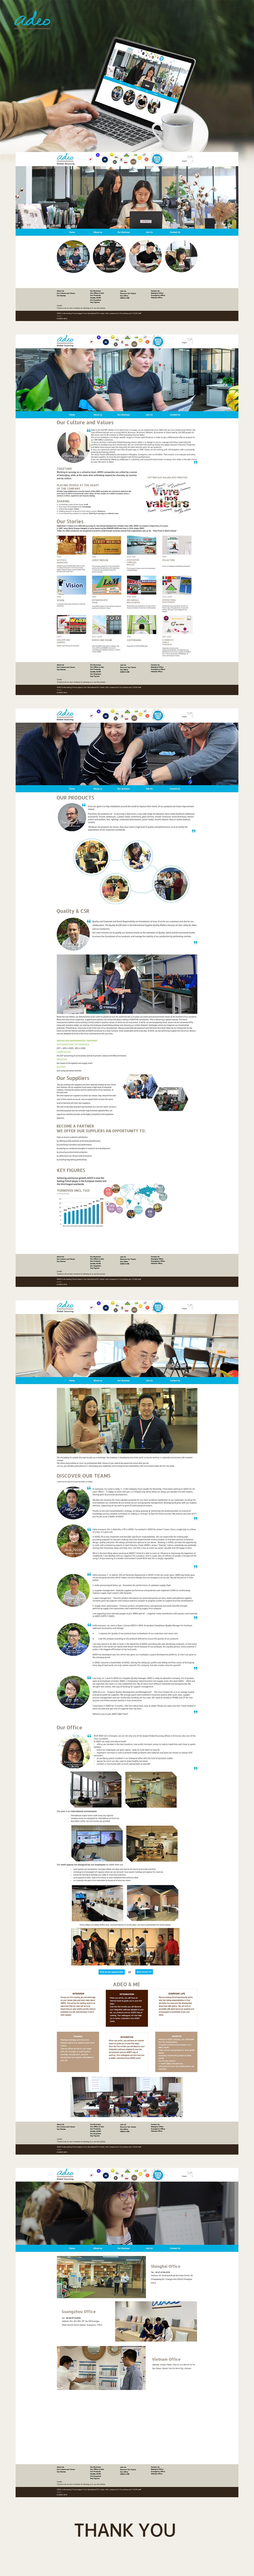 www.adeoglobalsourcing.com